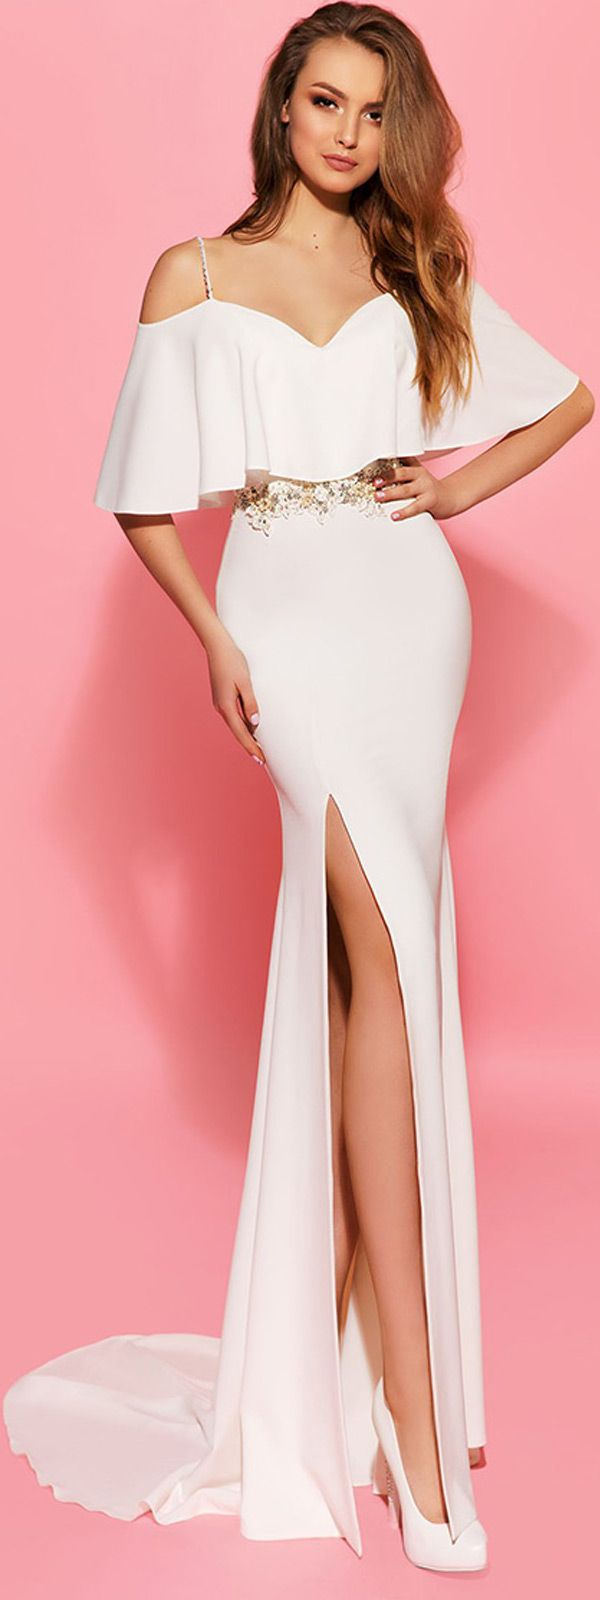 Amazing Acetate Satin Spaghetti Straps Sheath Wedding Dresses With Slit